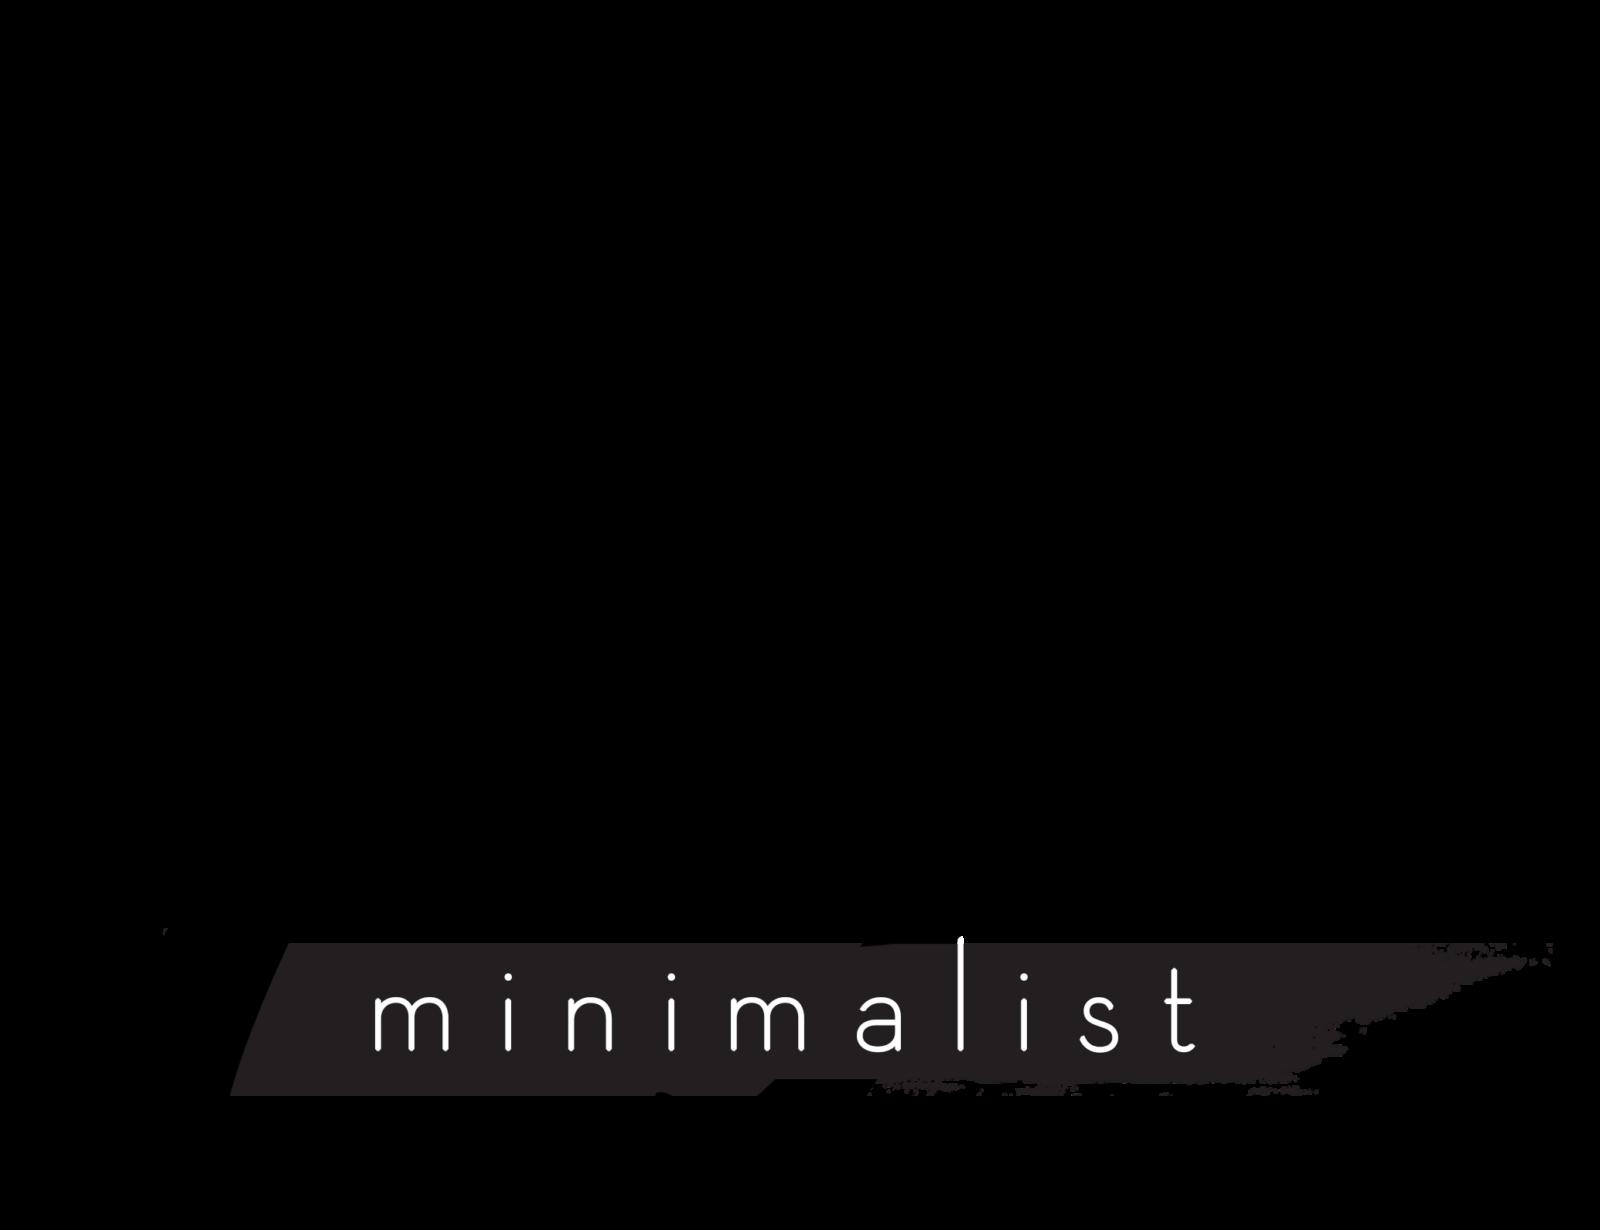 The FLY Minimalist